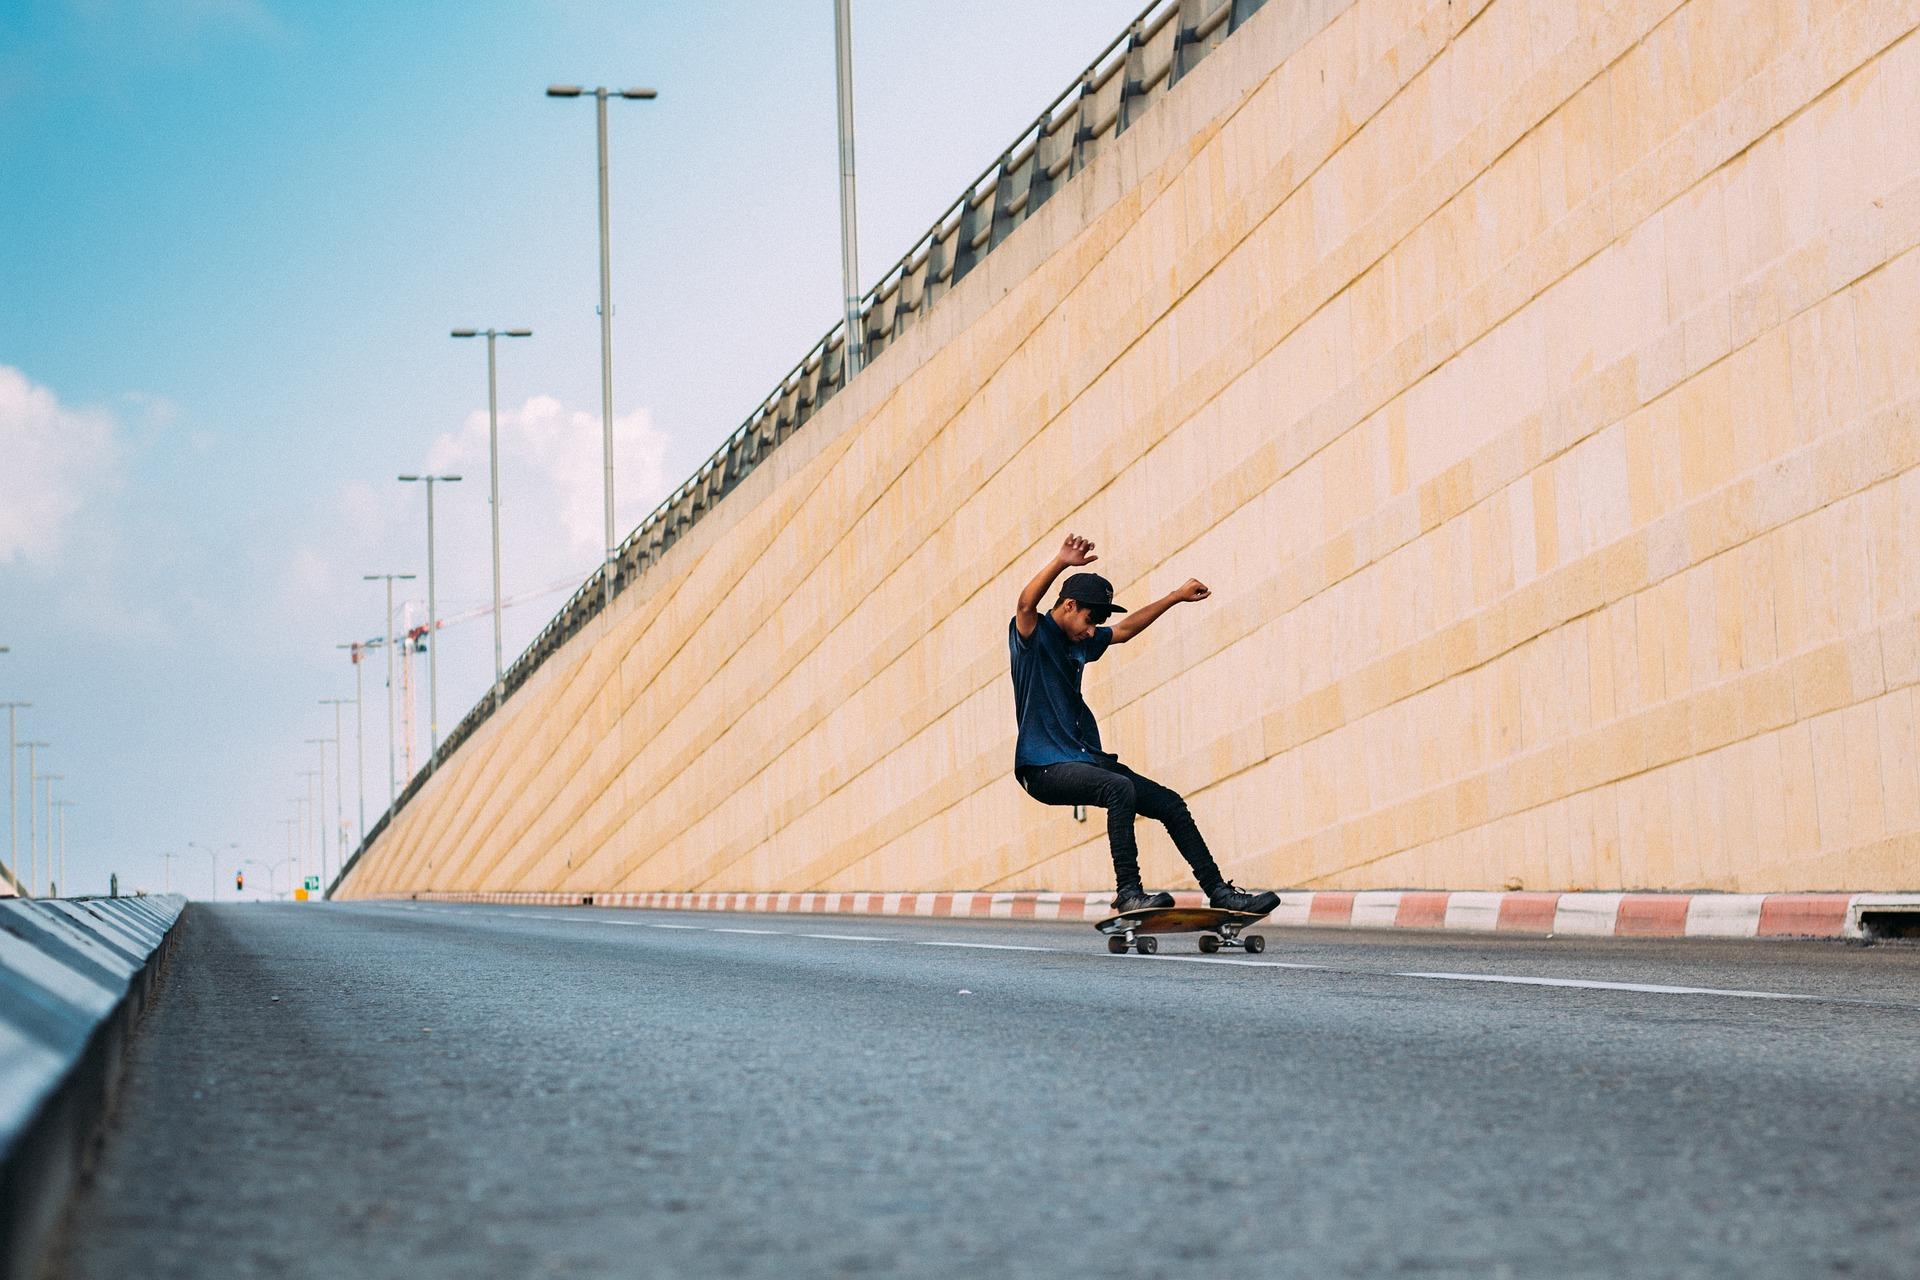 Orientation Weeprep Skate